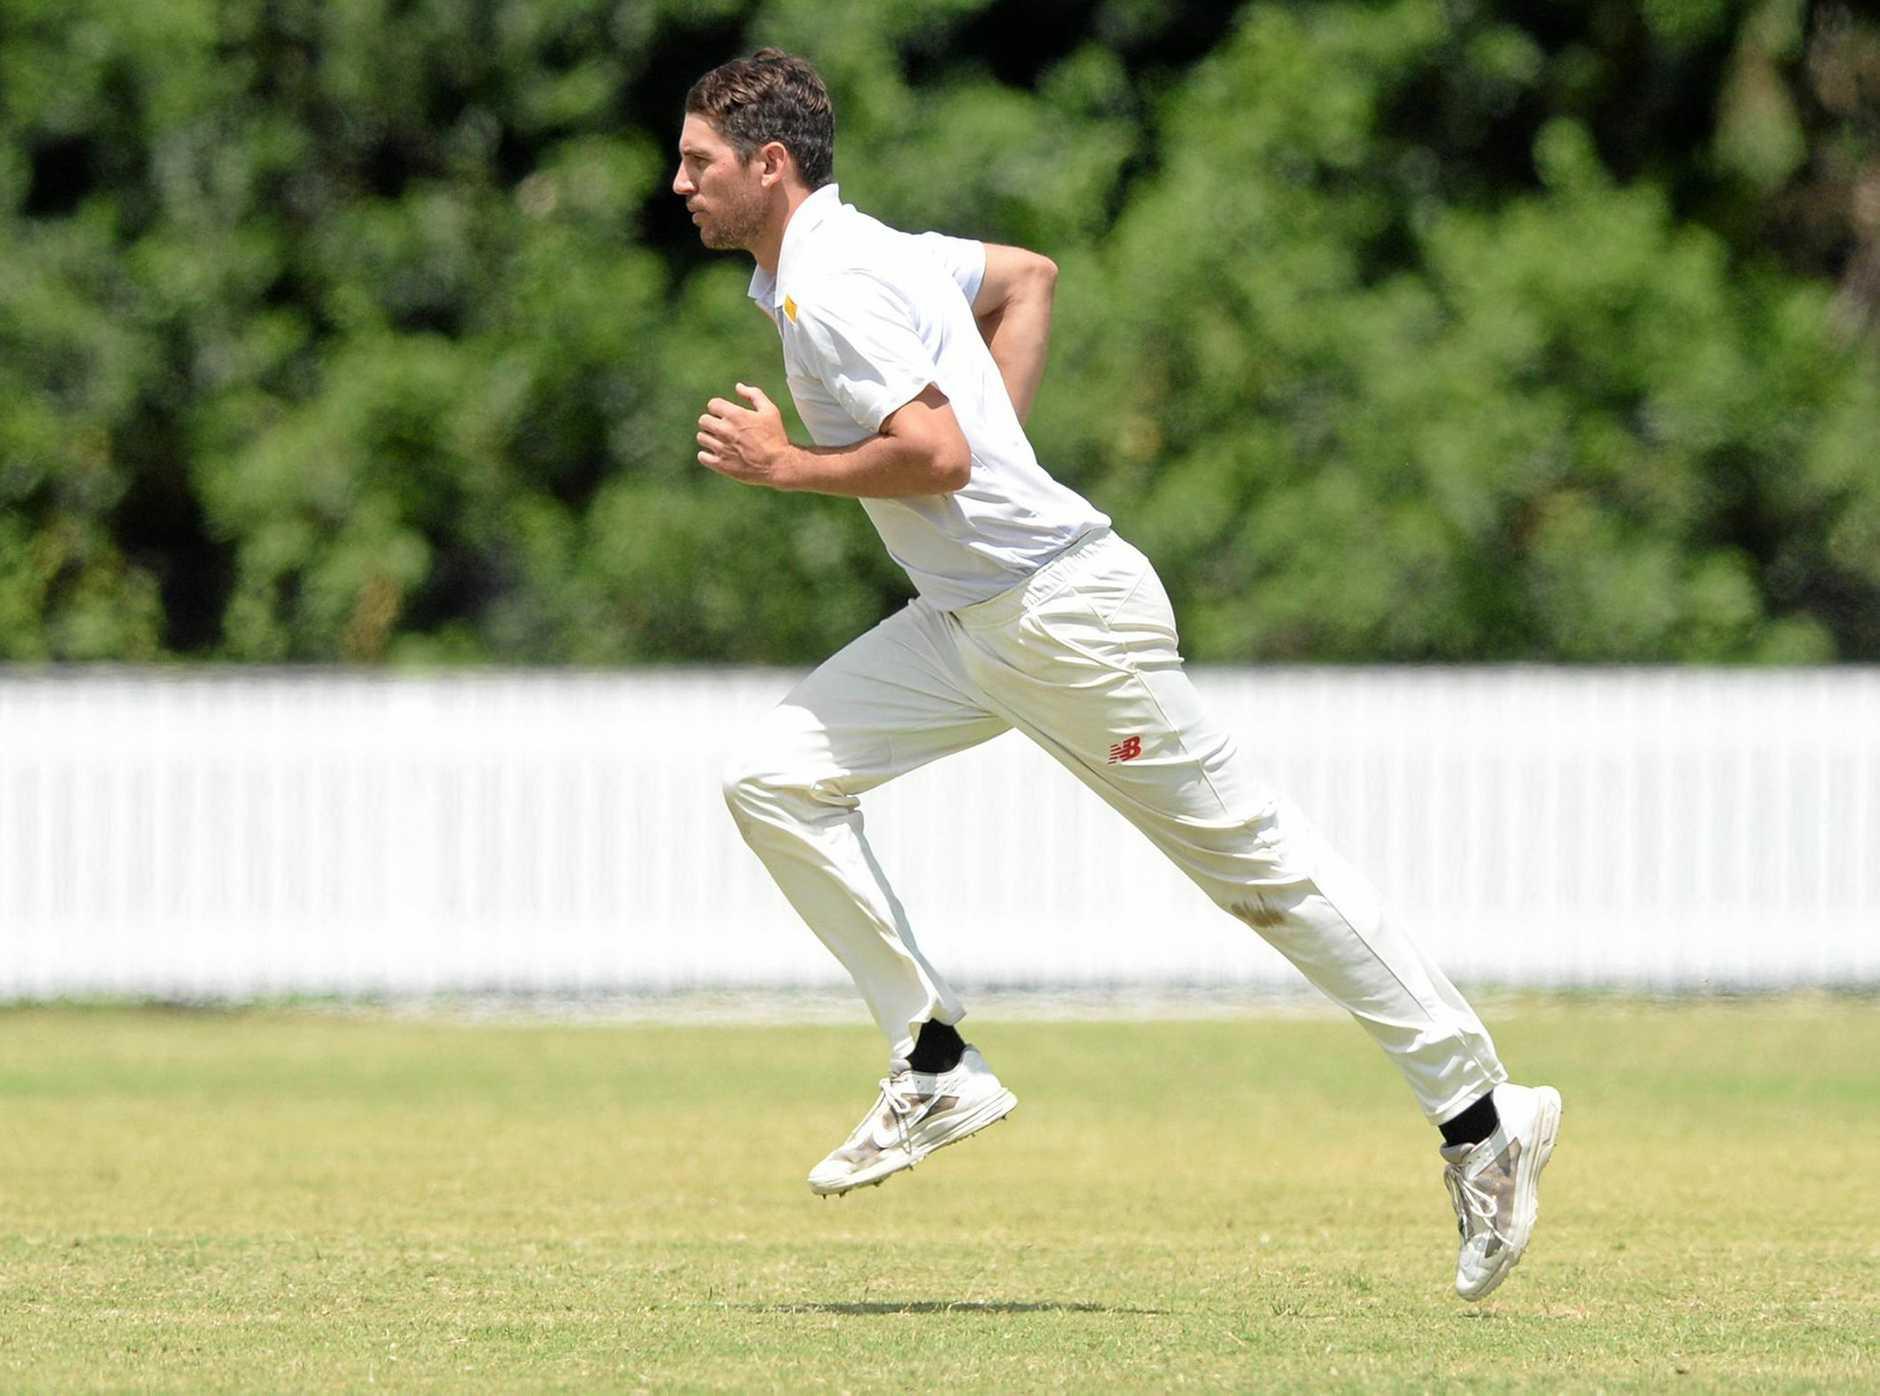 The Glen bowler Jason Seng in the cricket game against Frenchville.